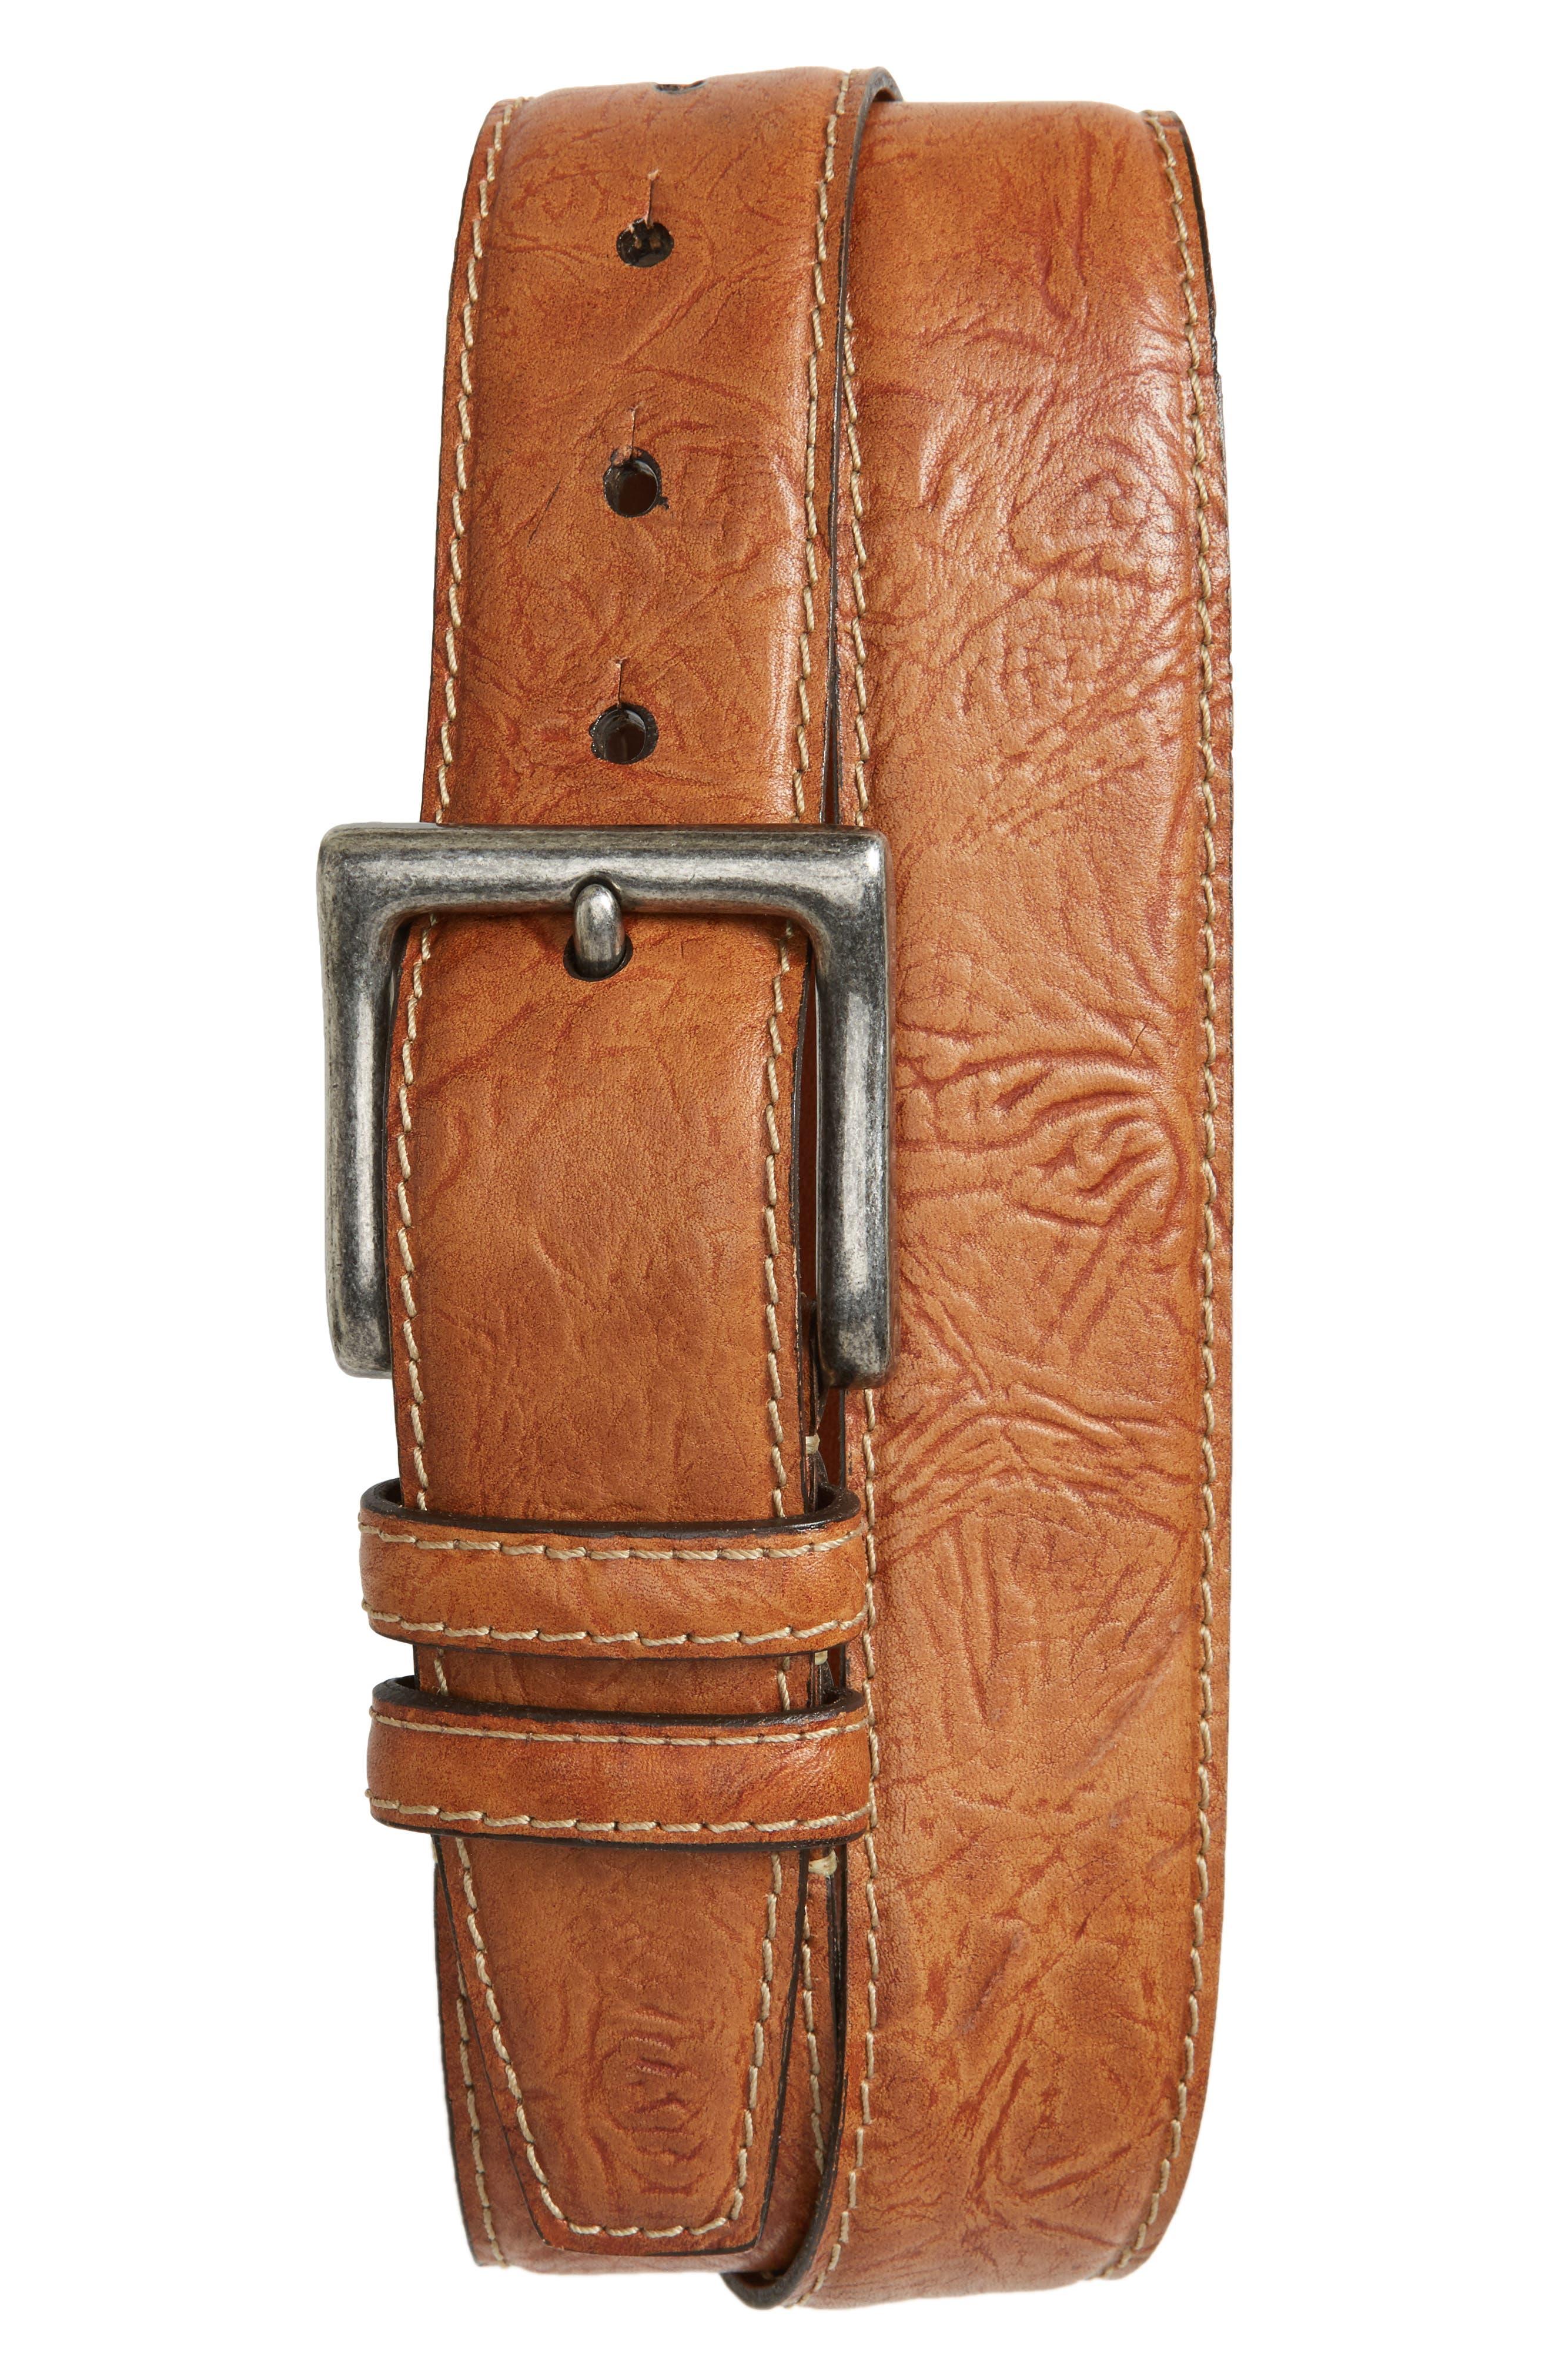 Torino Belts Puckered Leather Belt